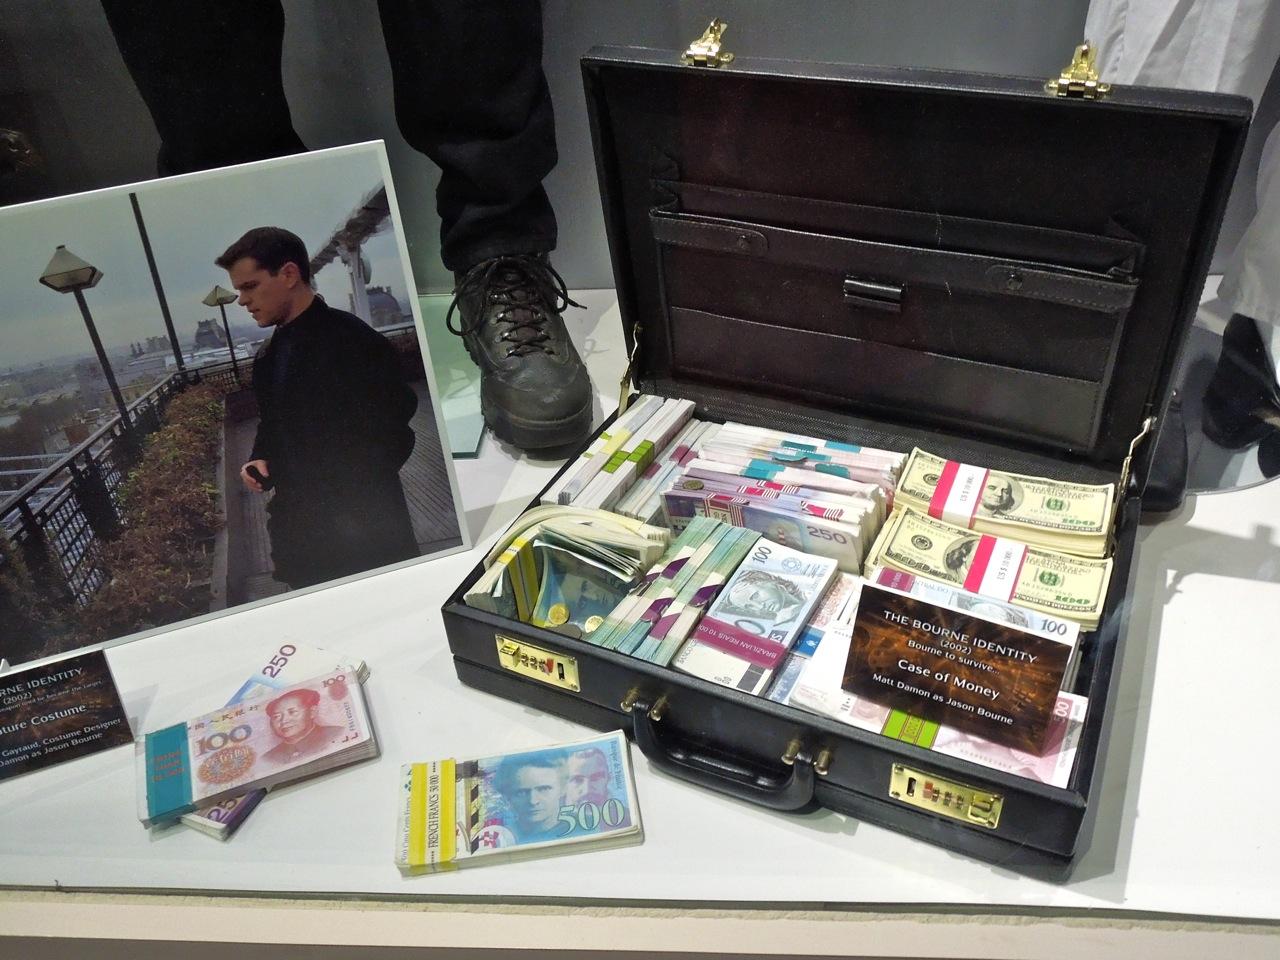 http://2.bp.blogspot.com/-HGNr_jPU0xE/T86IXpxyQKI/AAAAAAAAsKU/HI-3giPwtjs/s1600/bourne+identity+case+money+prop.jpg